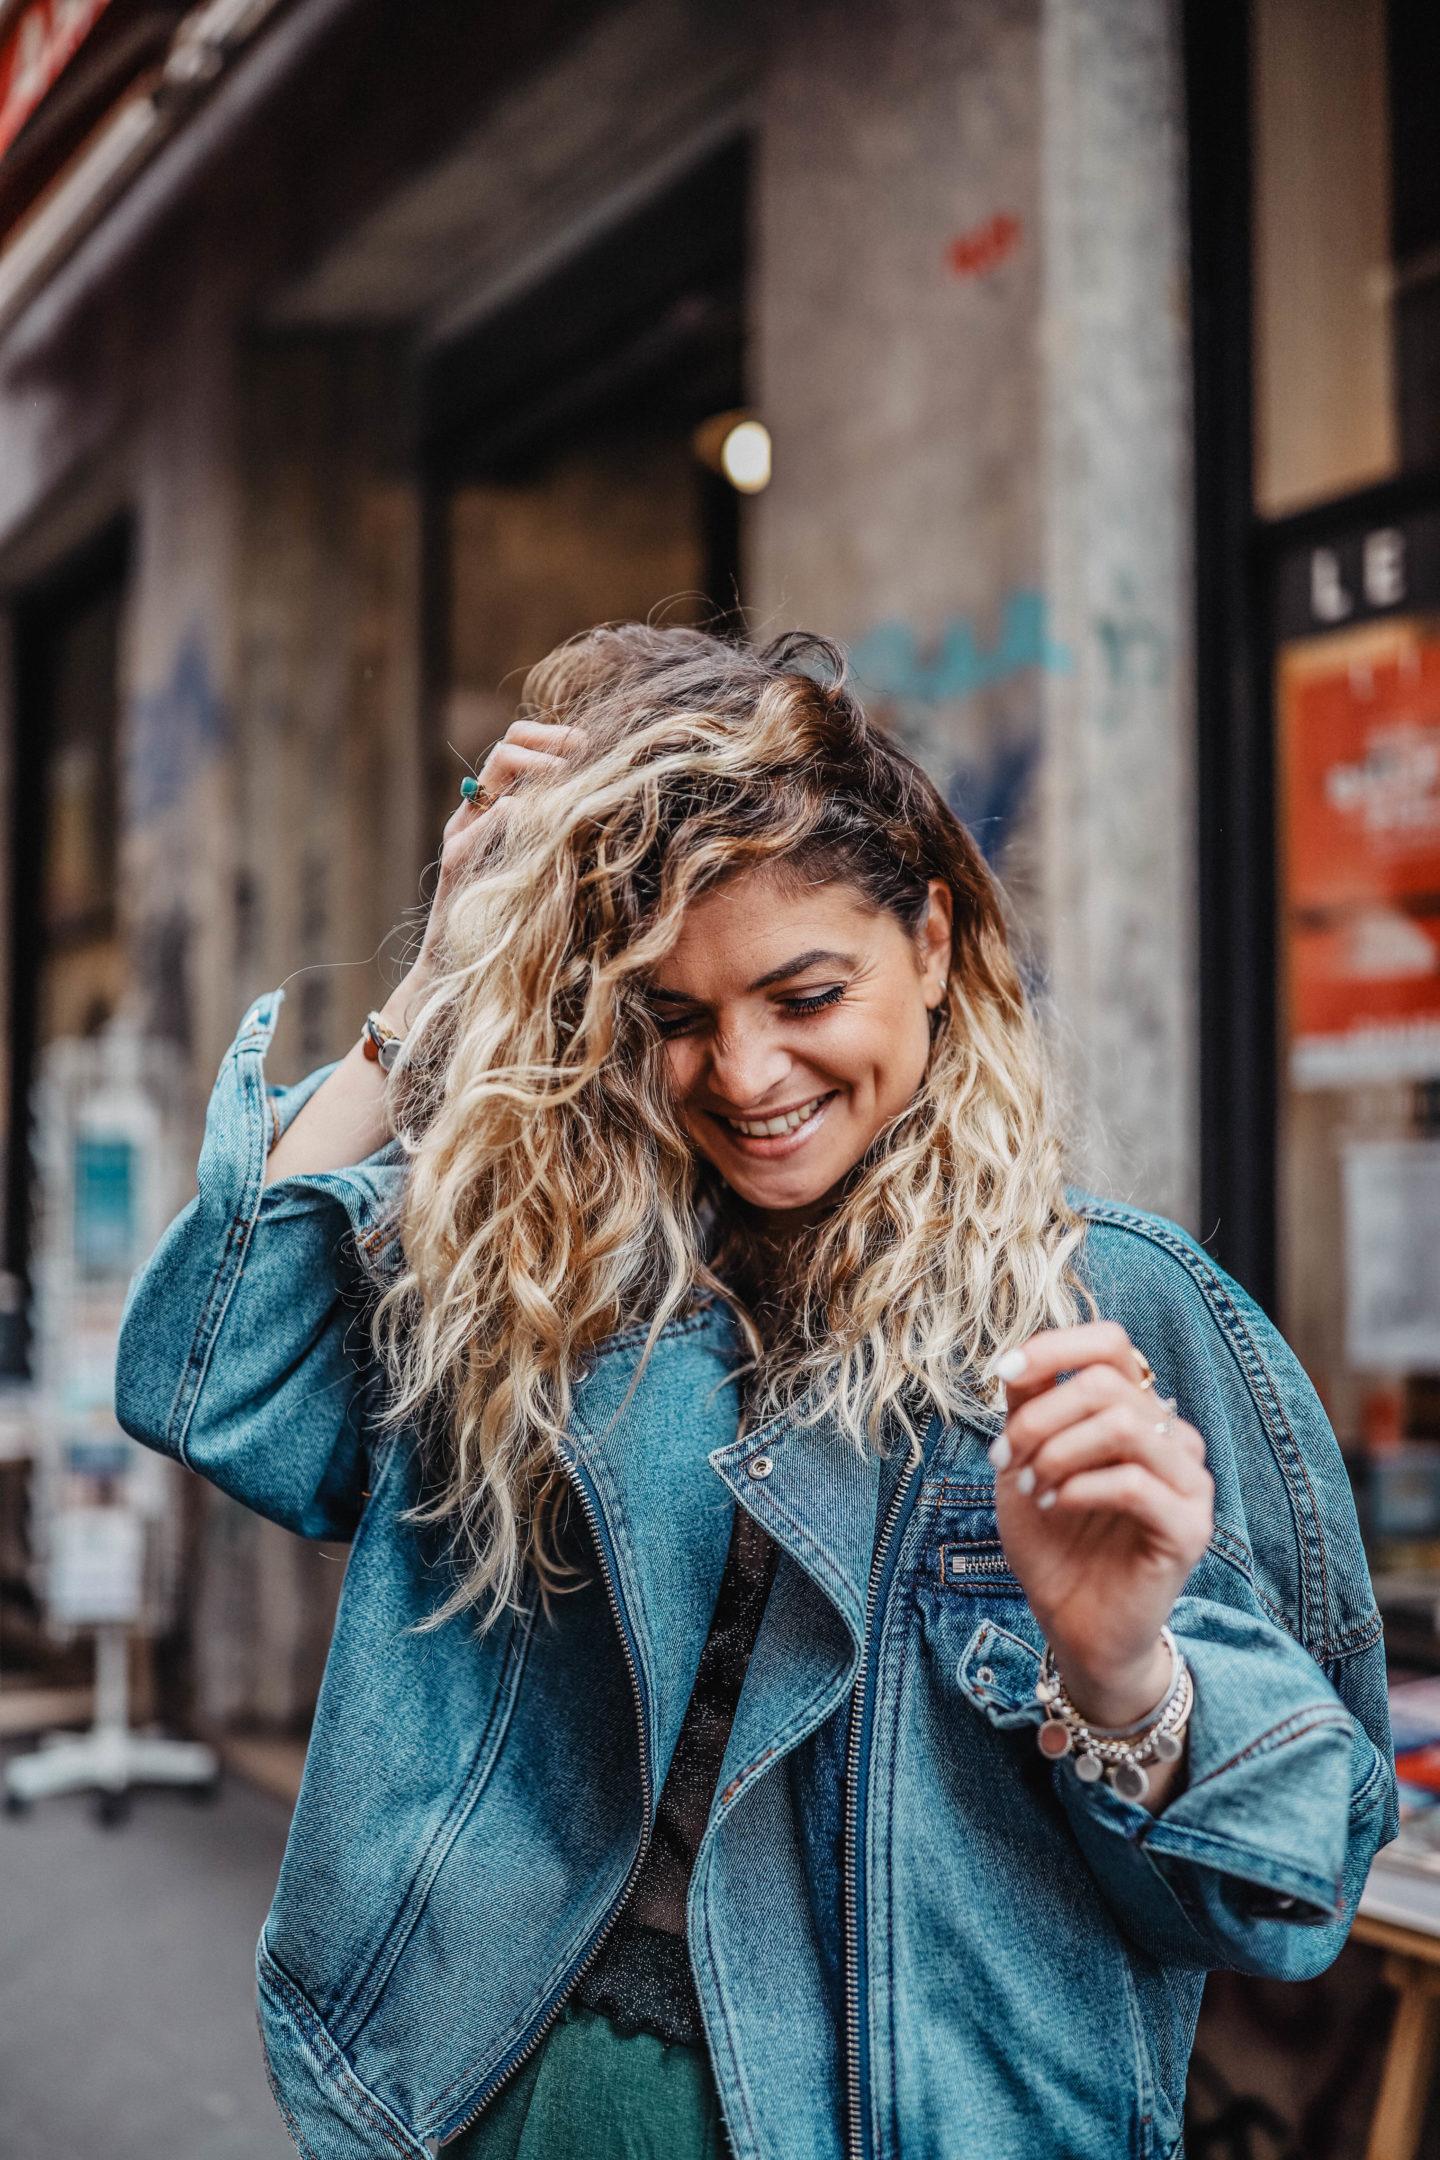 blogger marie and mood lyon